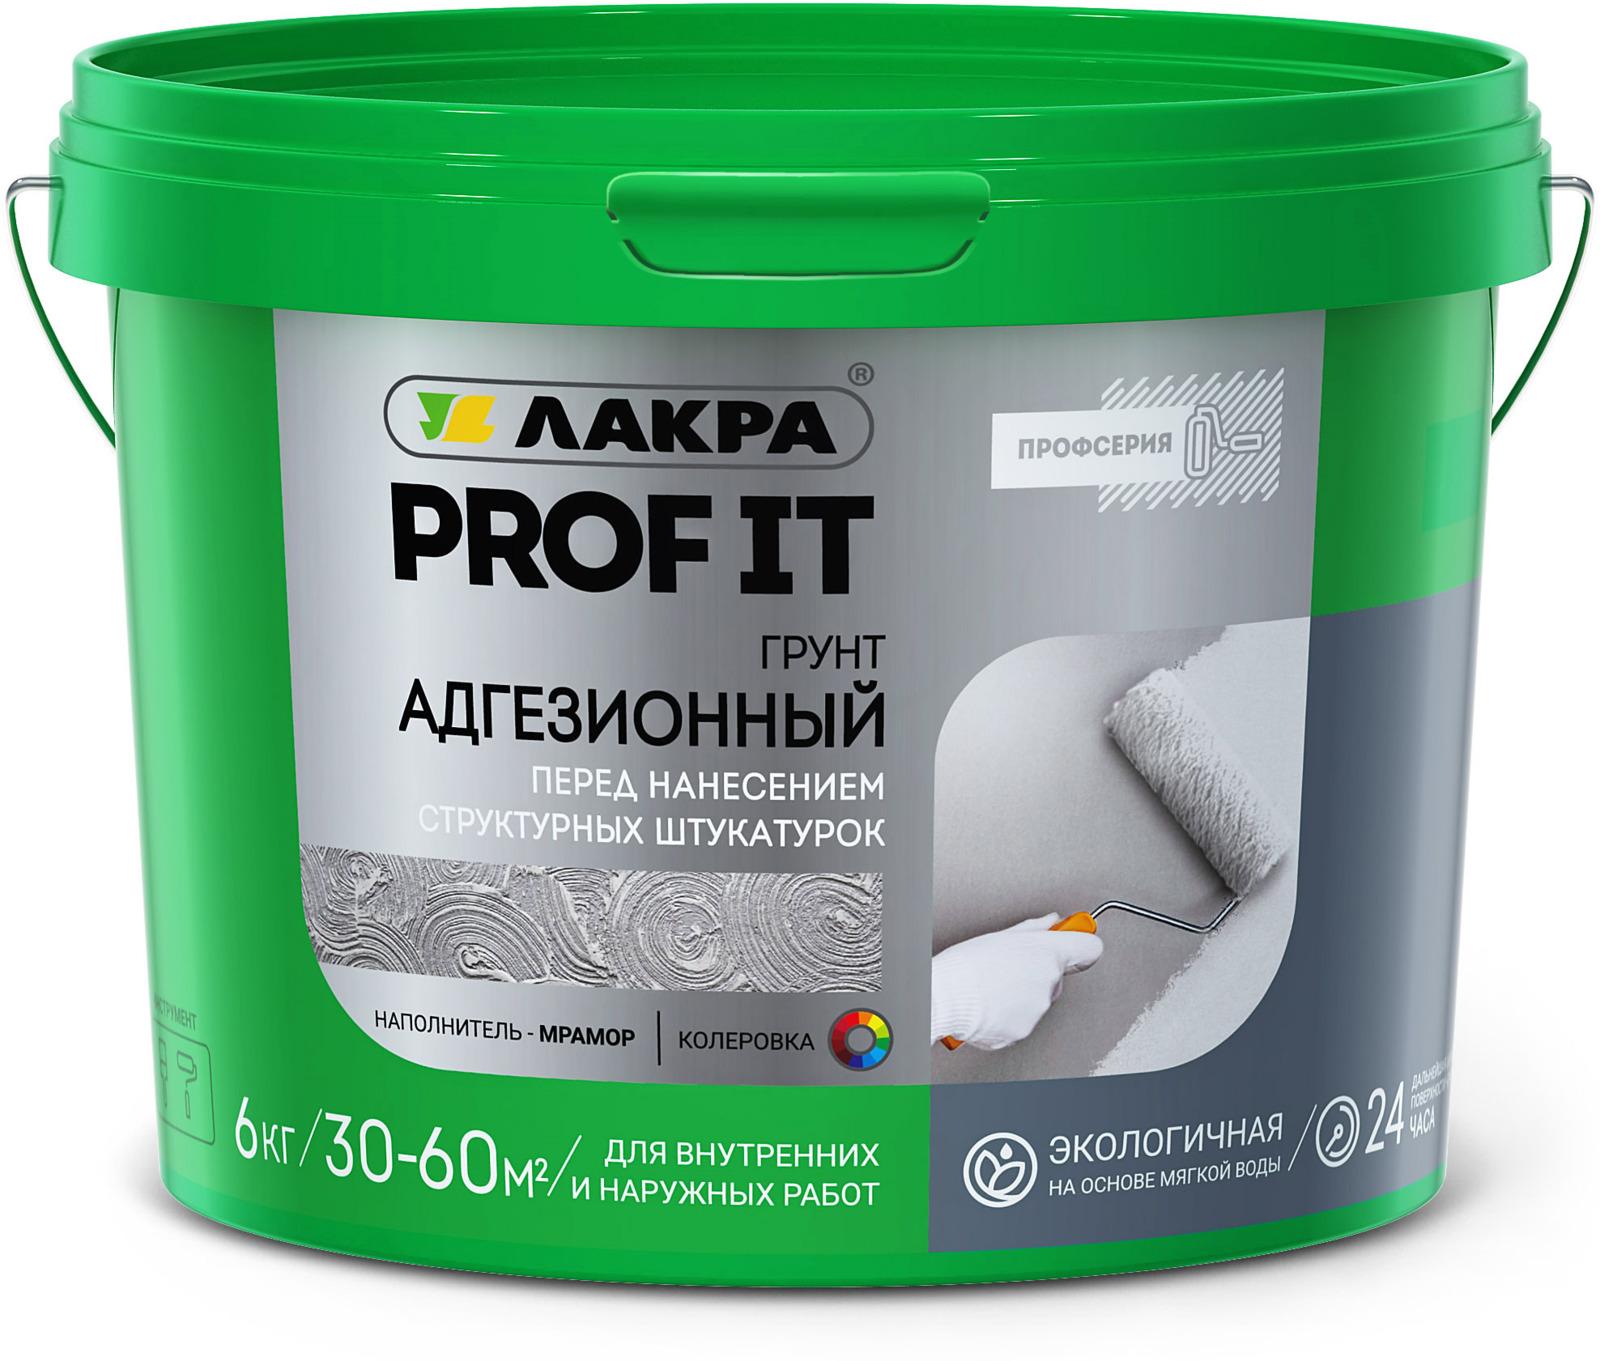 Грунтовка Prof It, адгезионная, белый, 6 кг цена 2017